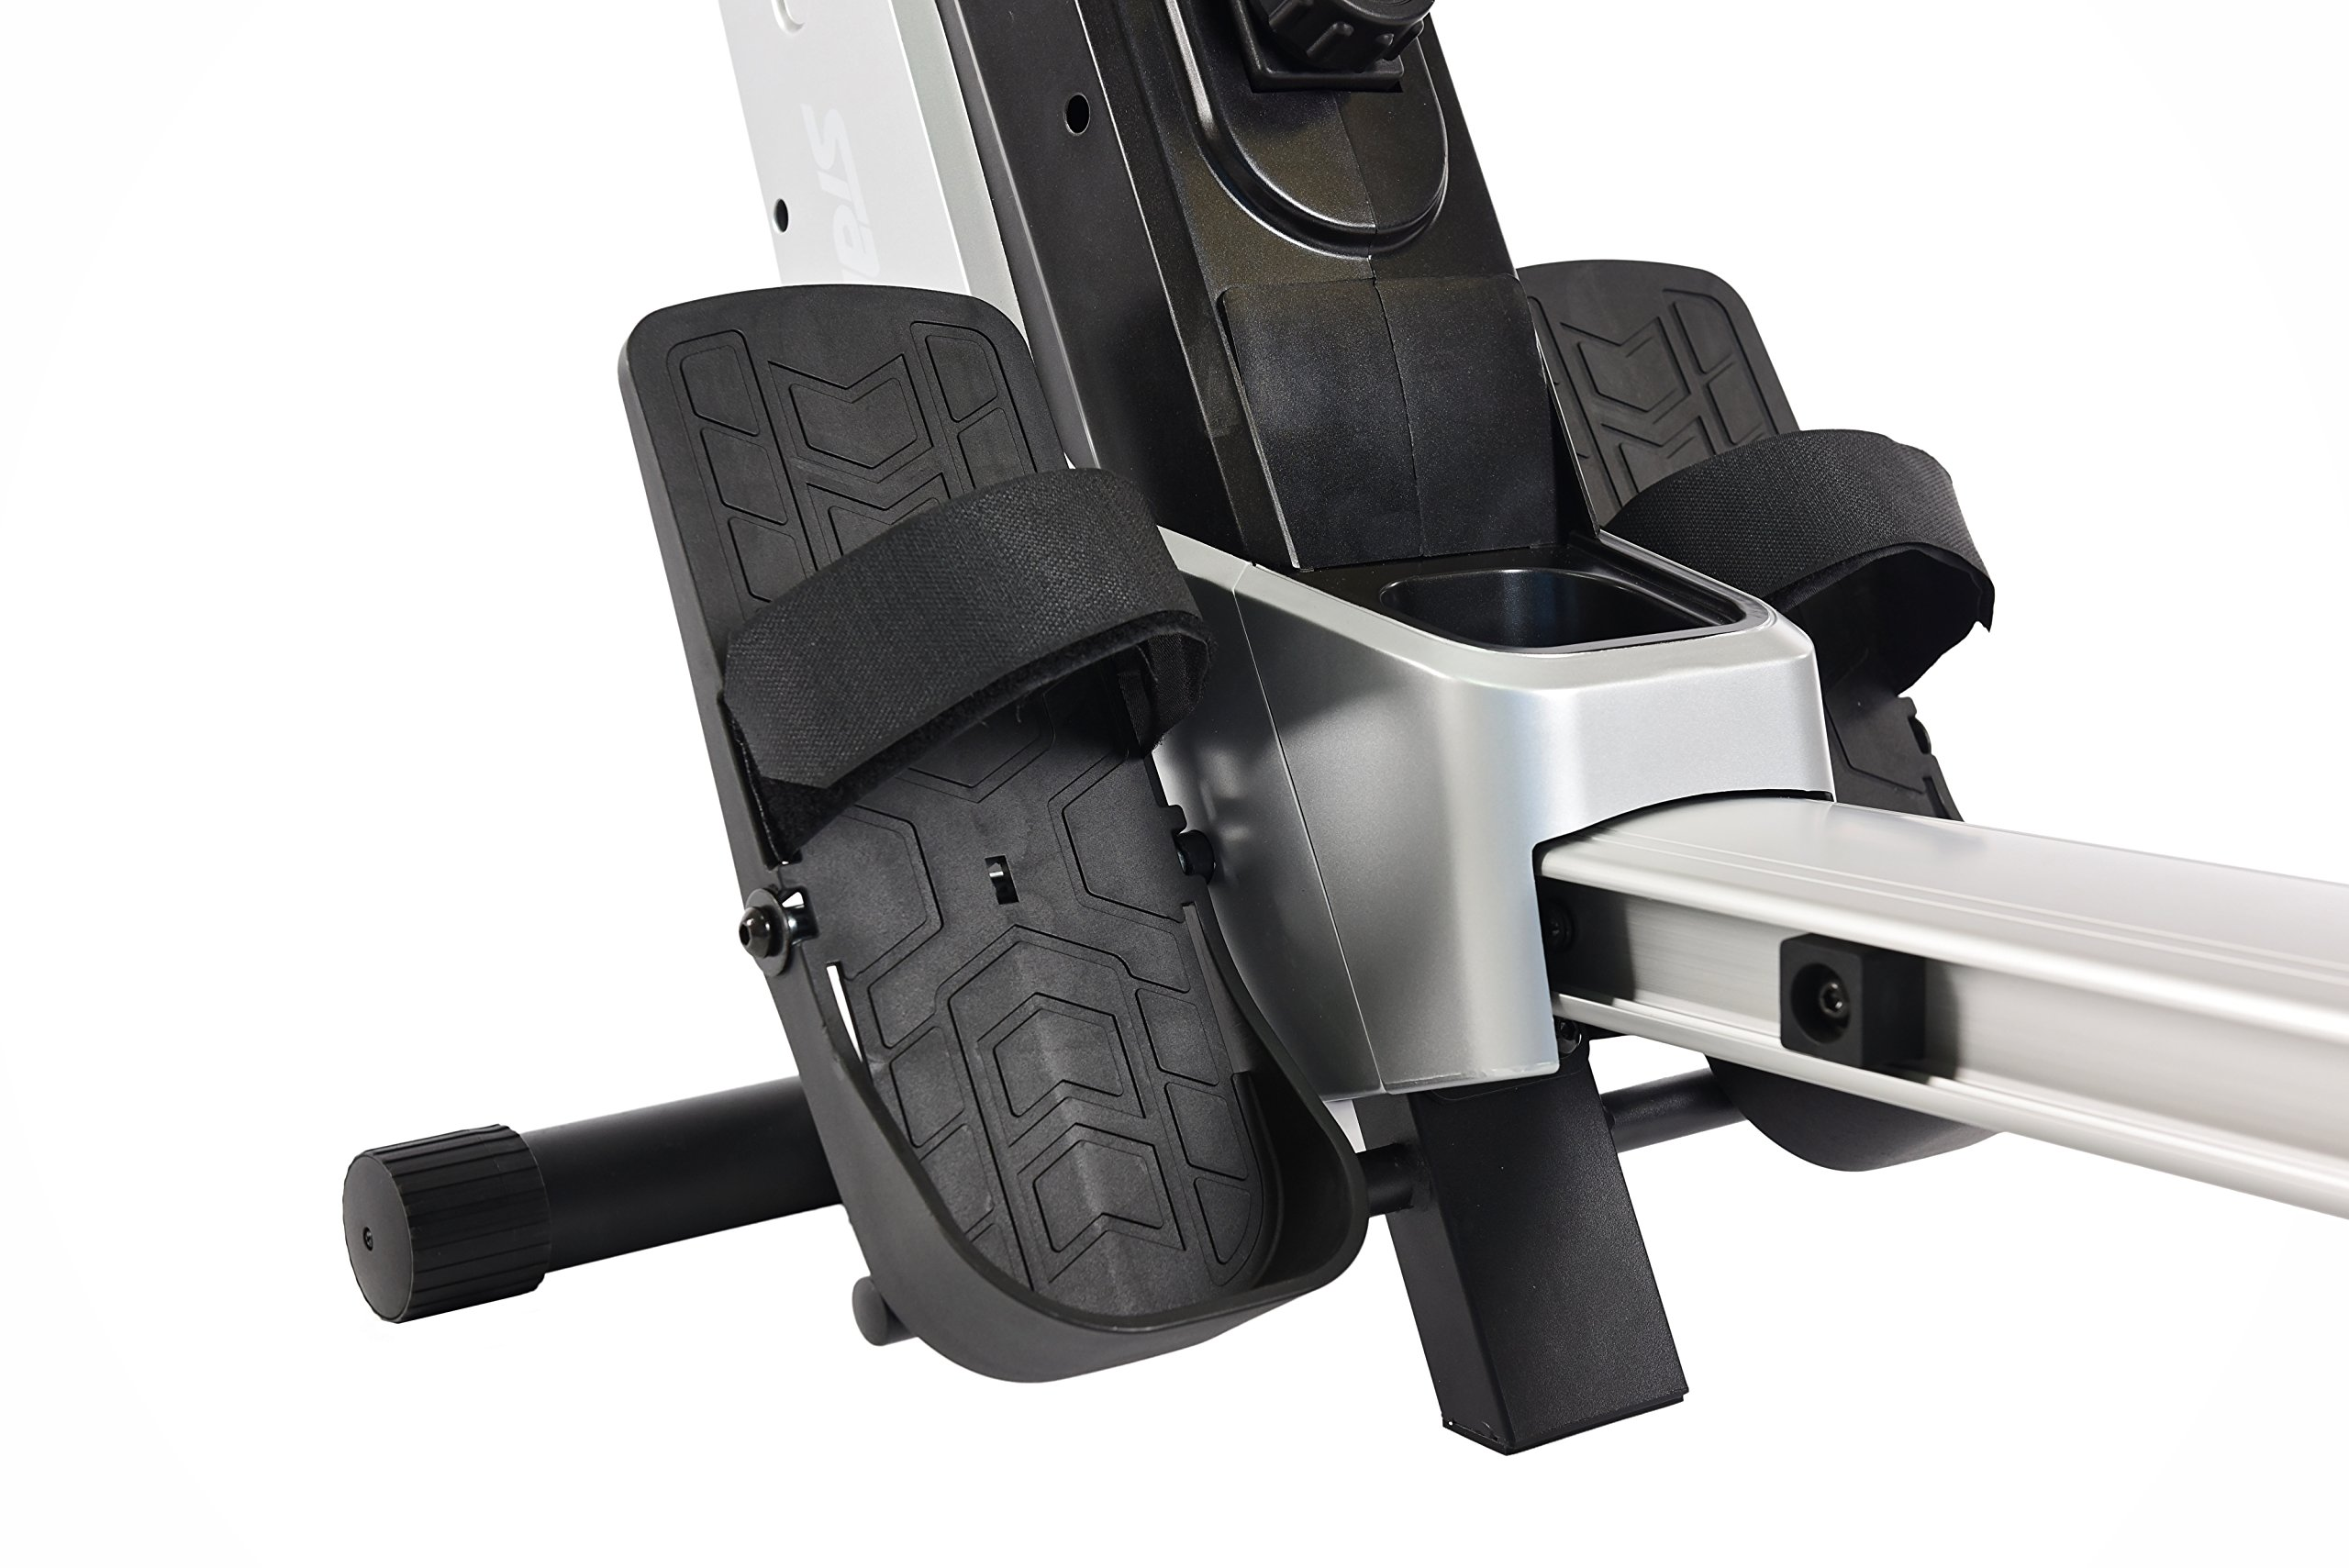 Stamina Magnetic Rowing Machine 1130 by Stamina (Image #7)